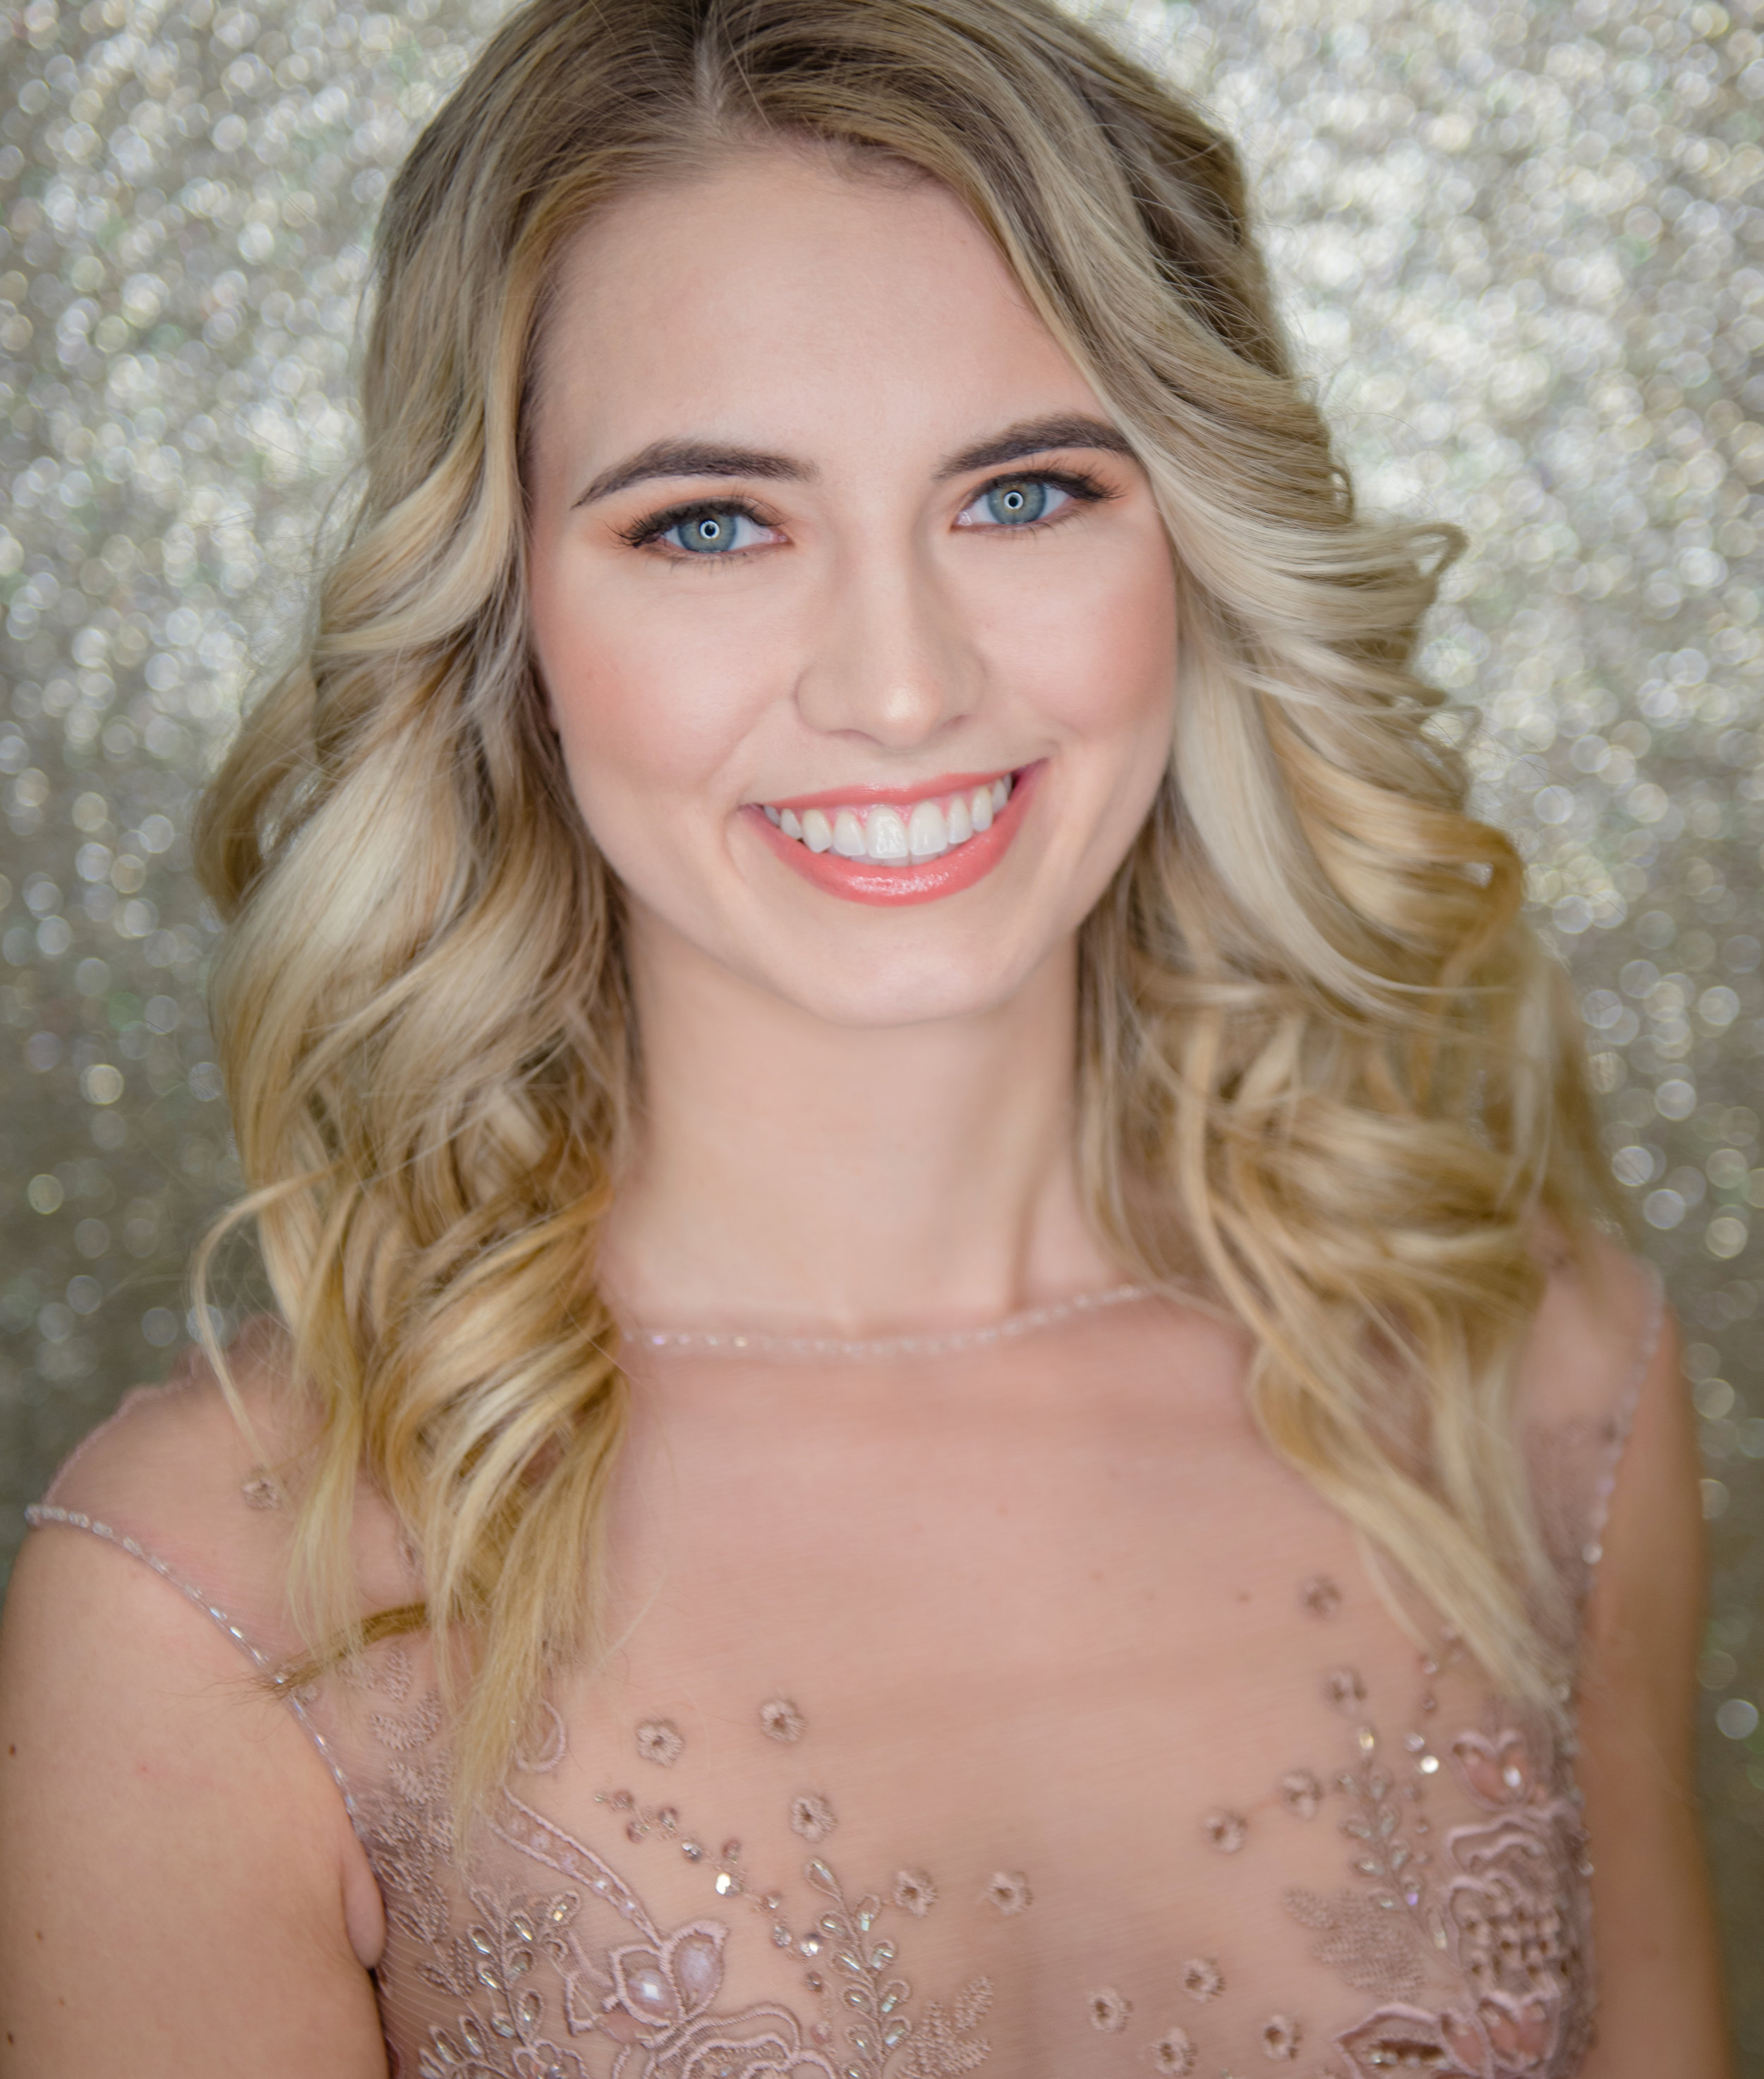 Tricia-Bennett-Bridal-makeup8.jpg